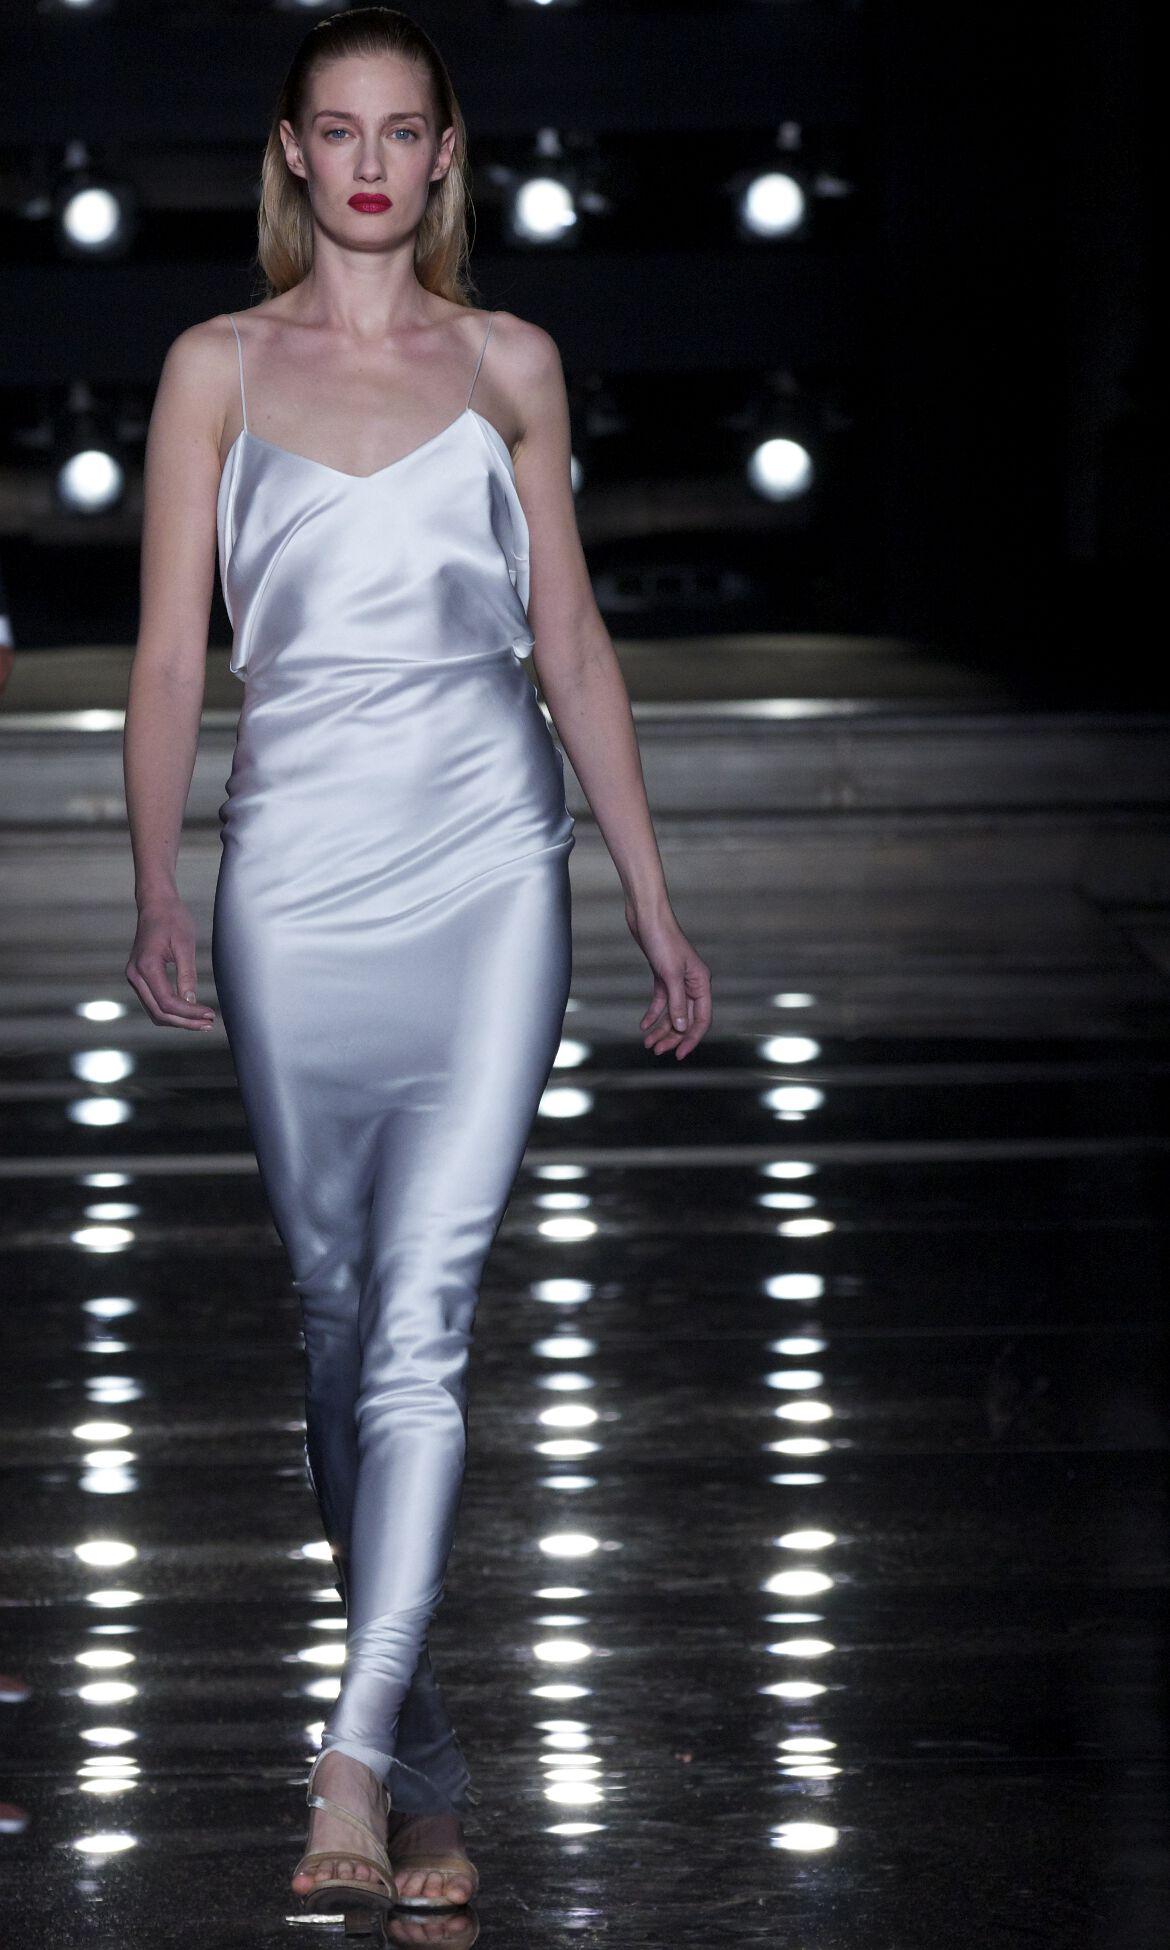 Ermanno Scervino Fashion Model White Dress